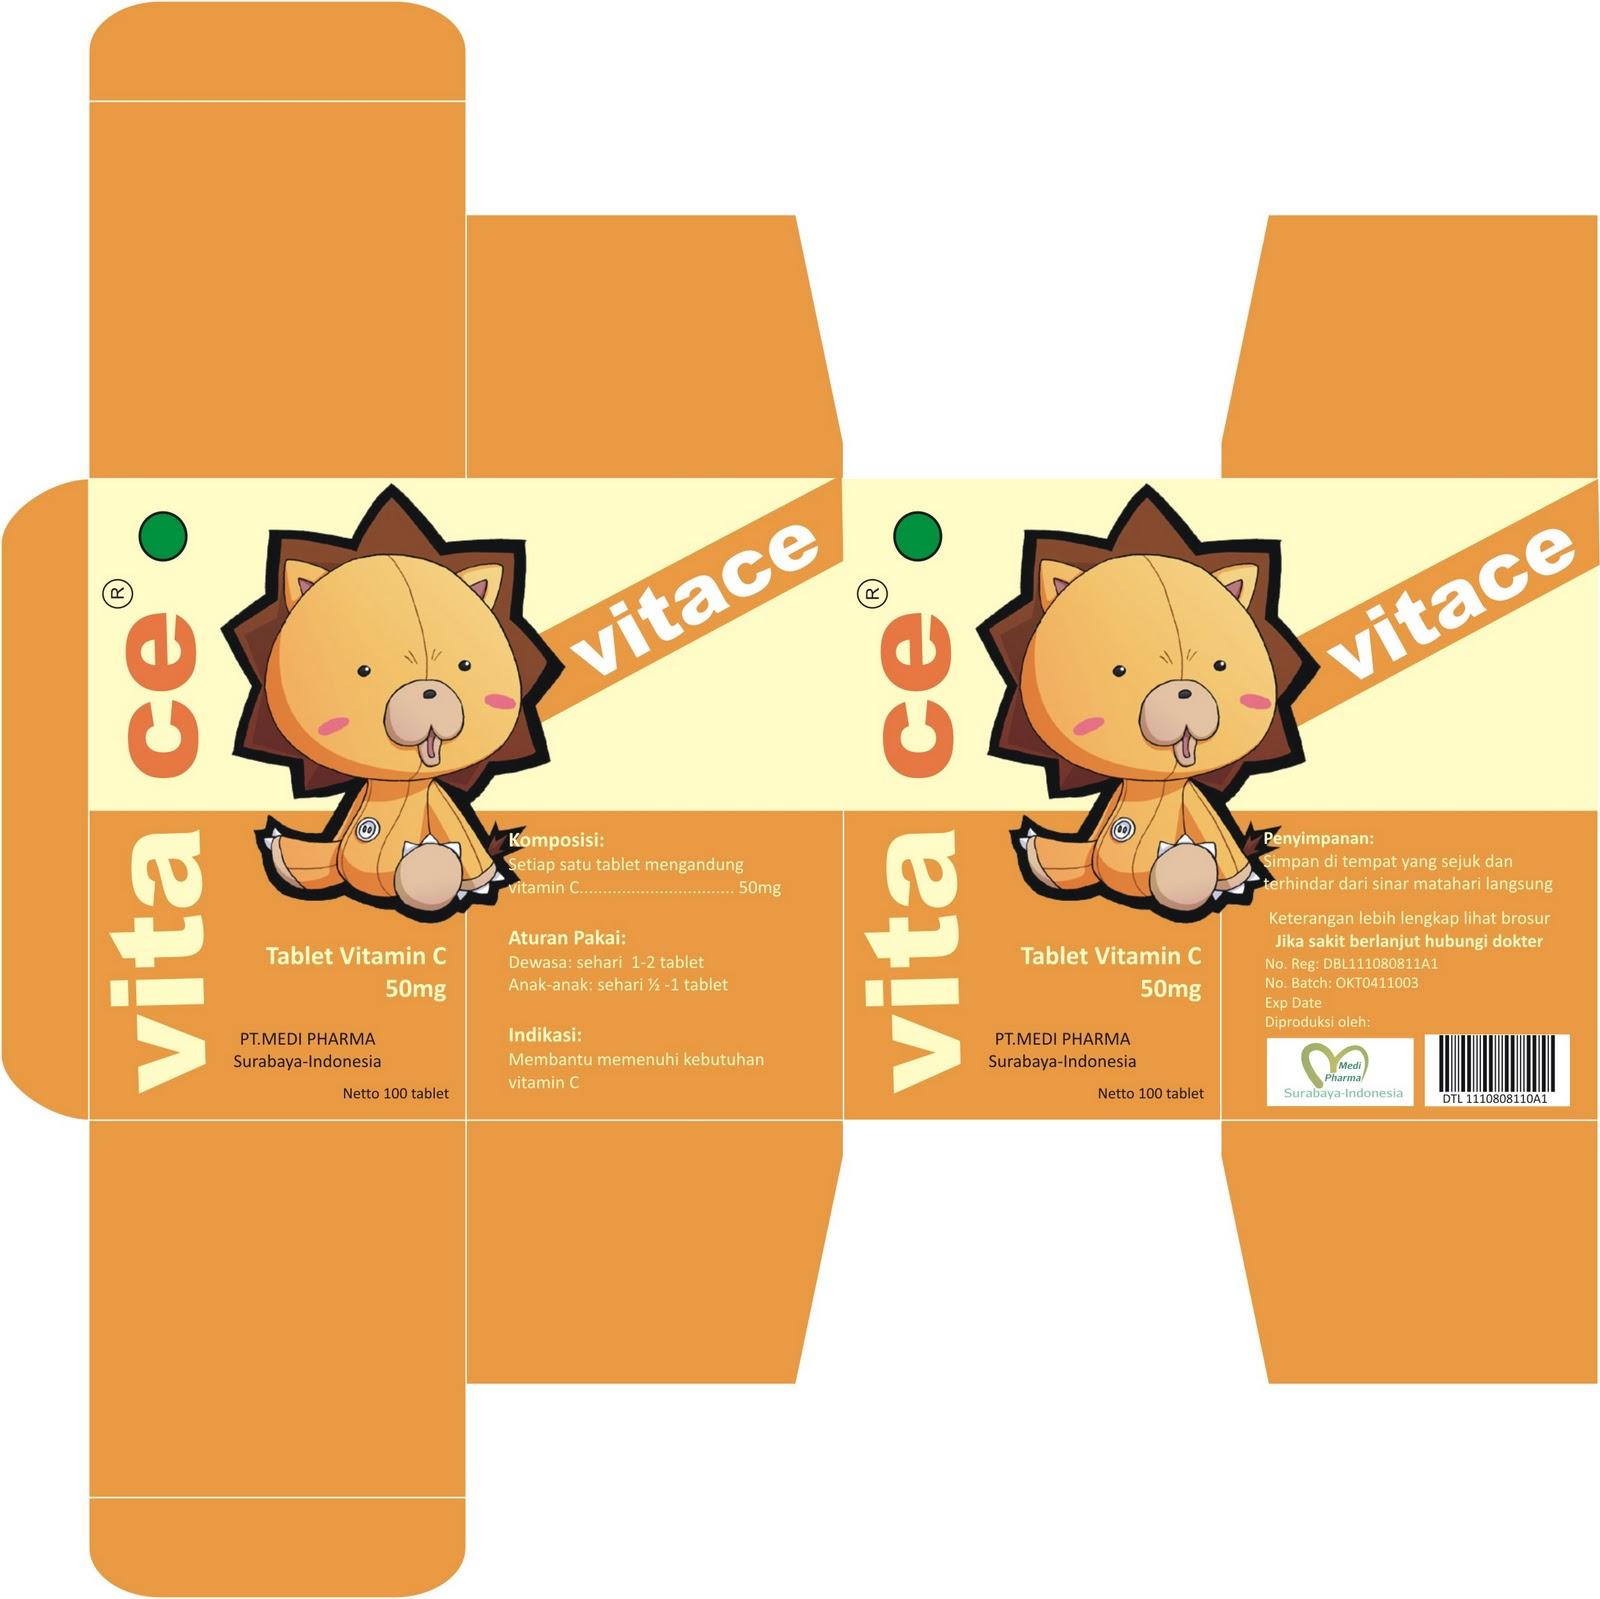 Desain Kemasancoreldraw: Jasa Desain Packaging